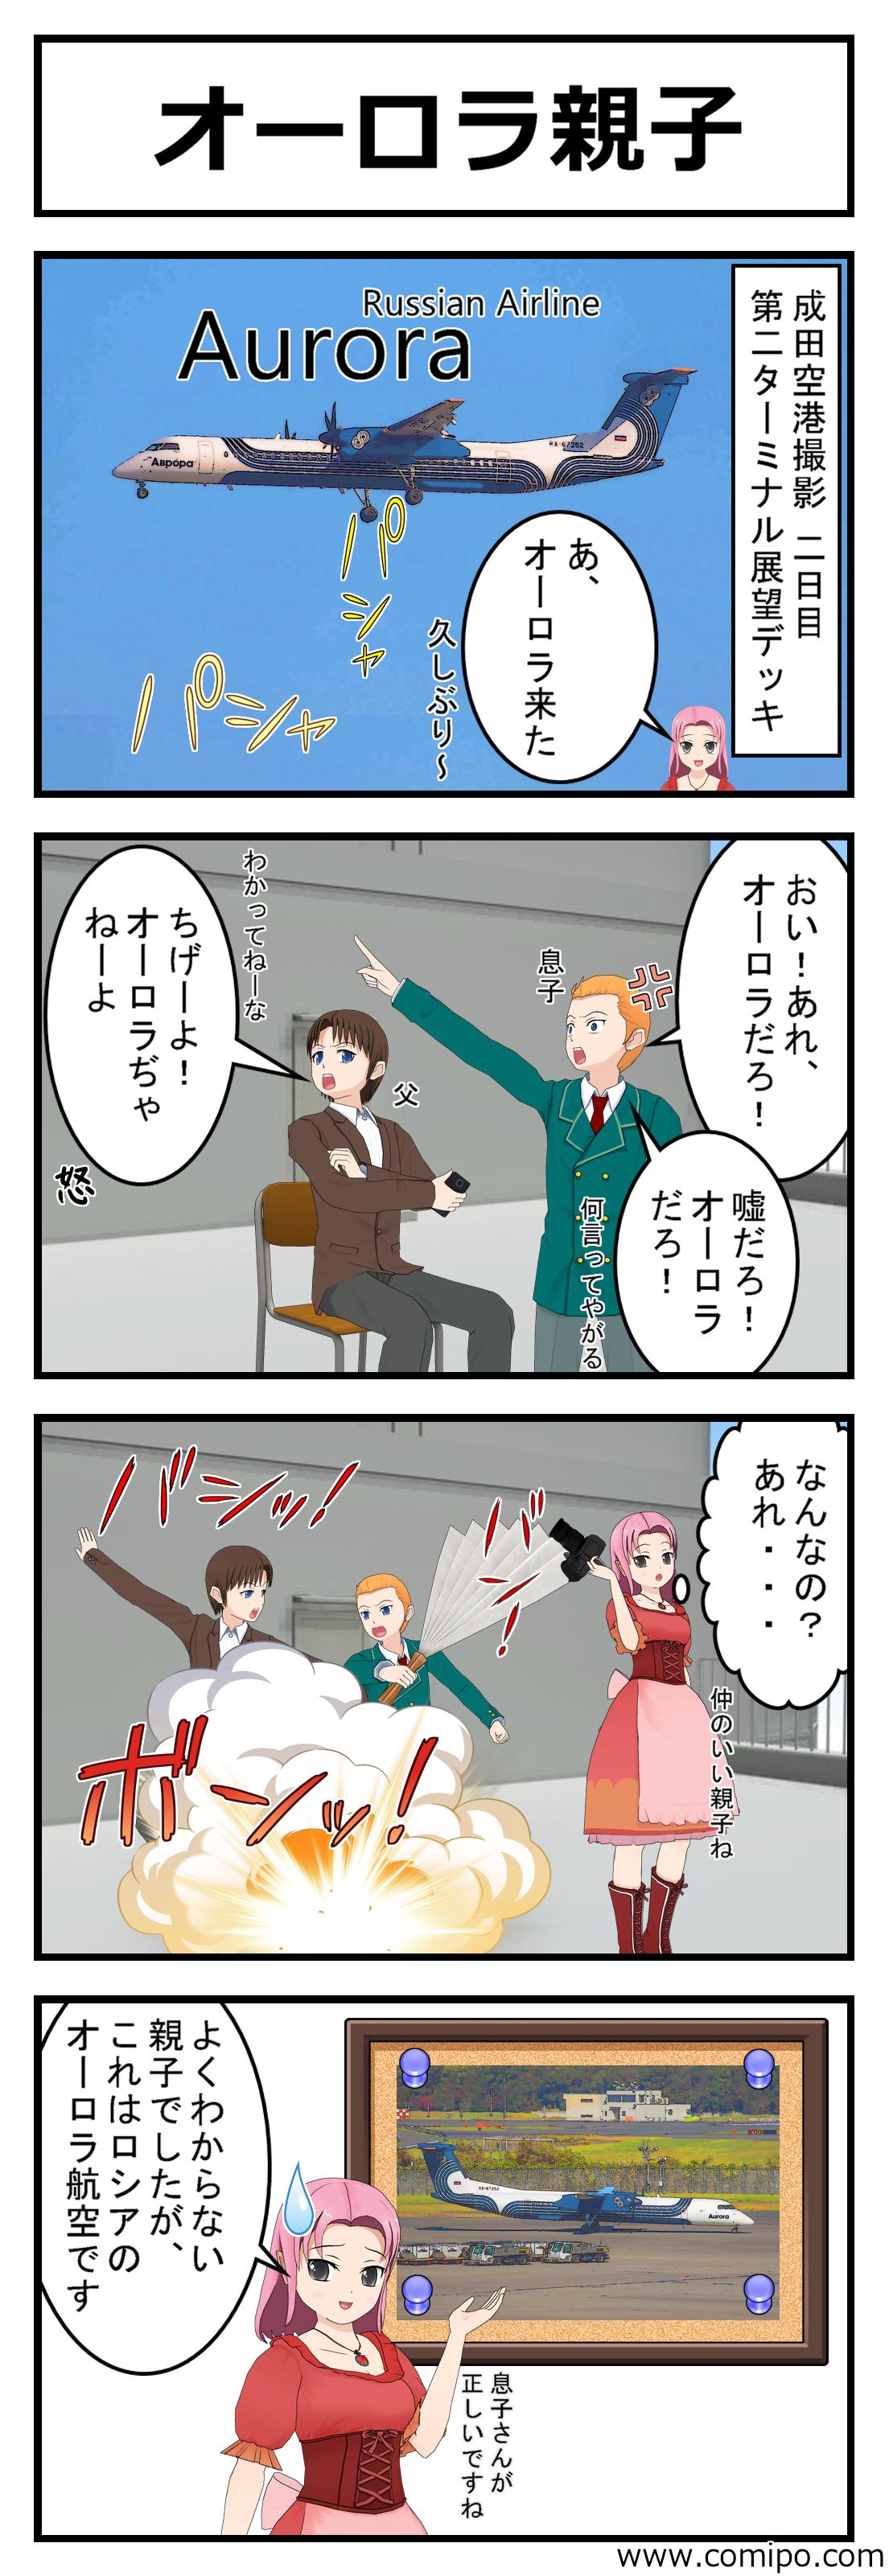 https://cdn-ak.f.st-hatena.com/images/fotolife/t/tomohiko37_i/20181204/20181204011242.png